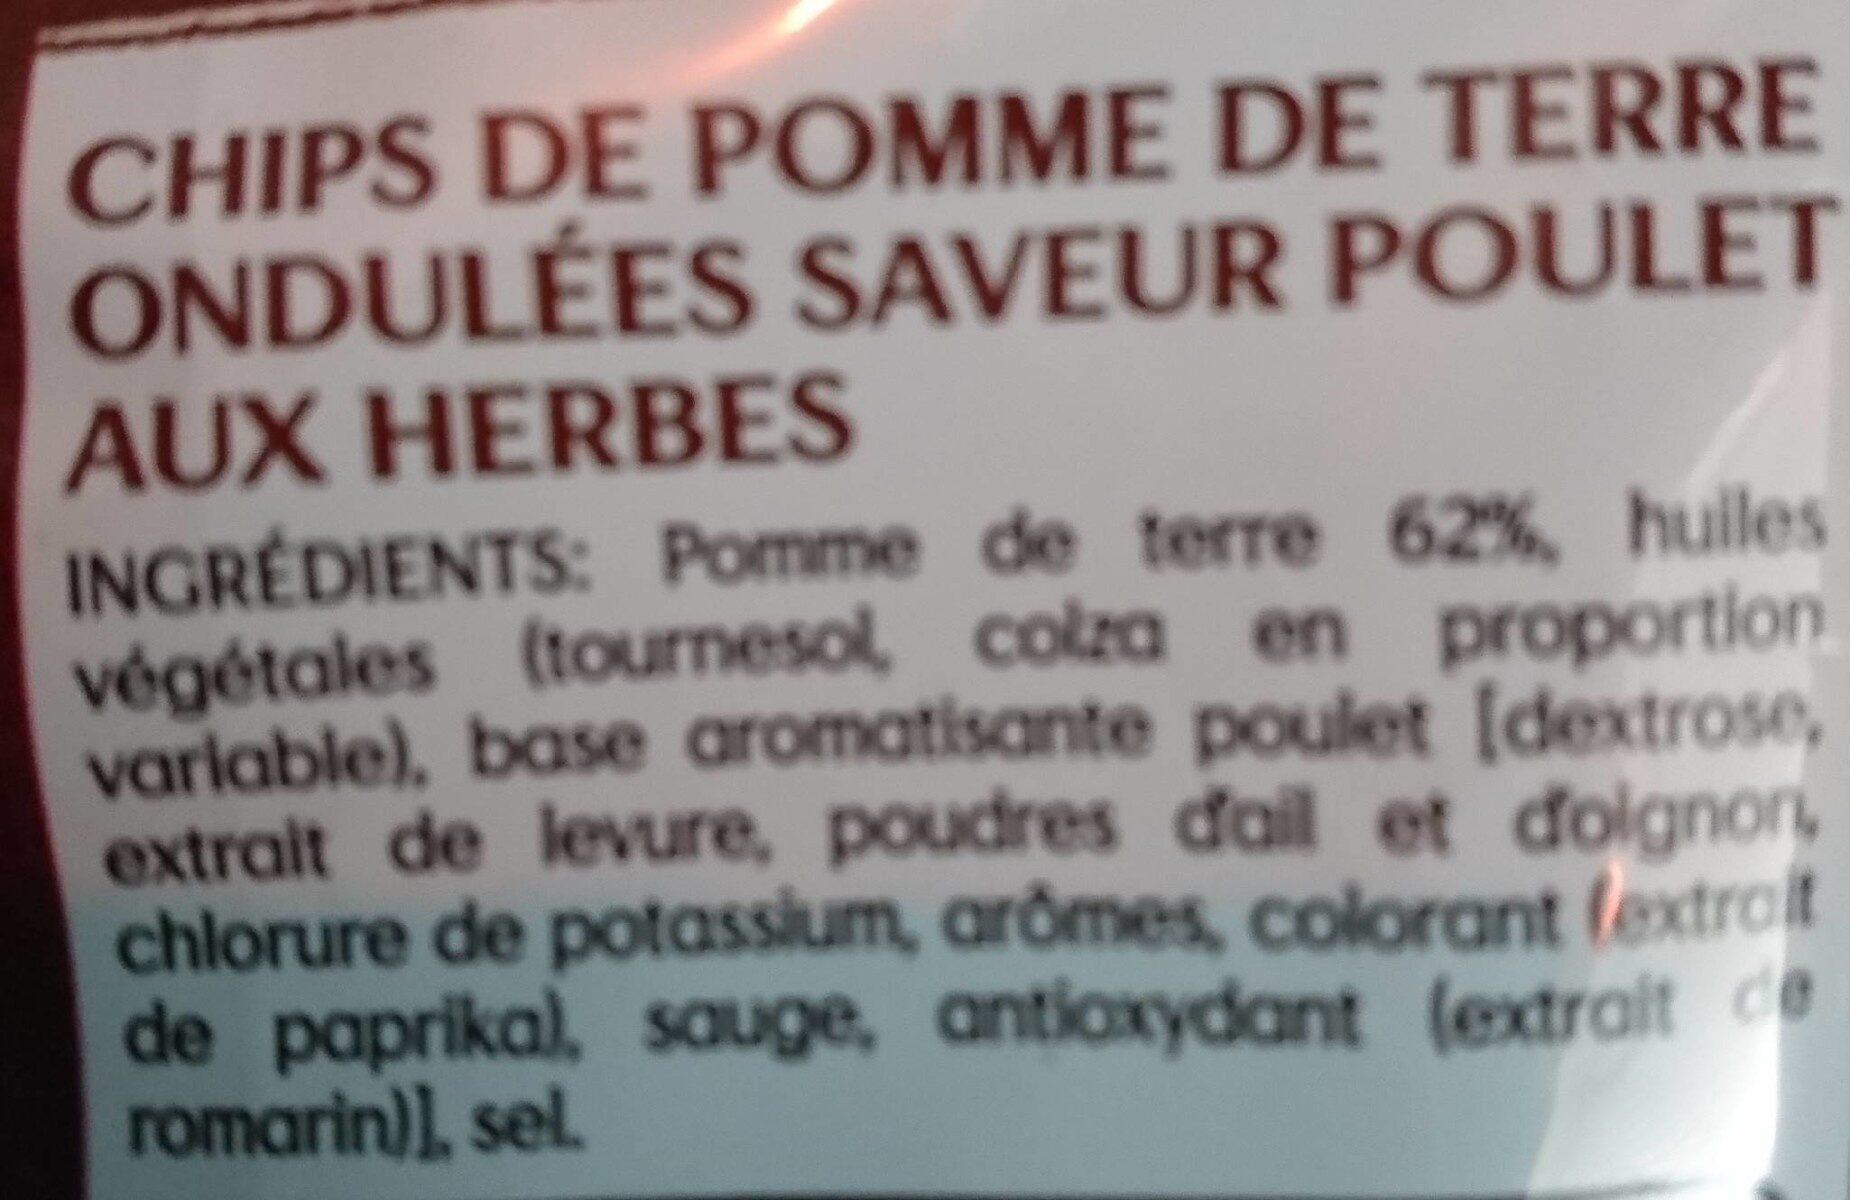 Lay's max saveur poulet aux herbes - Ingredienti - fr